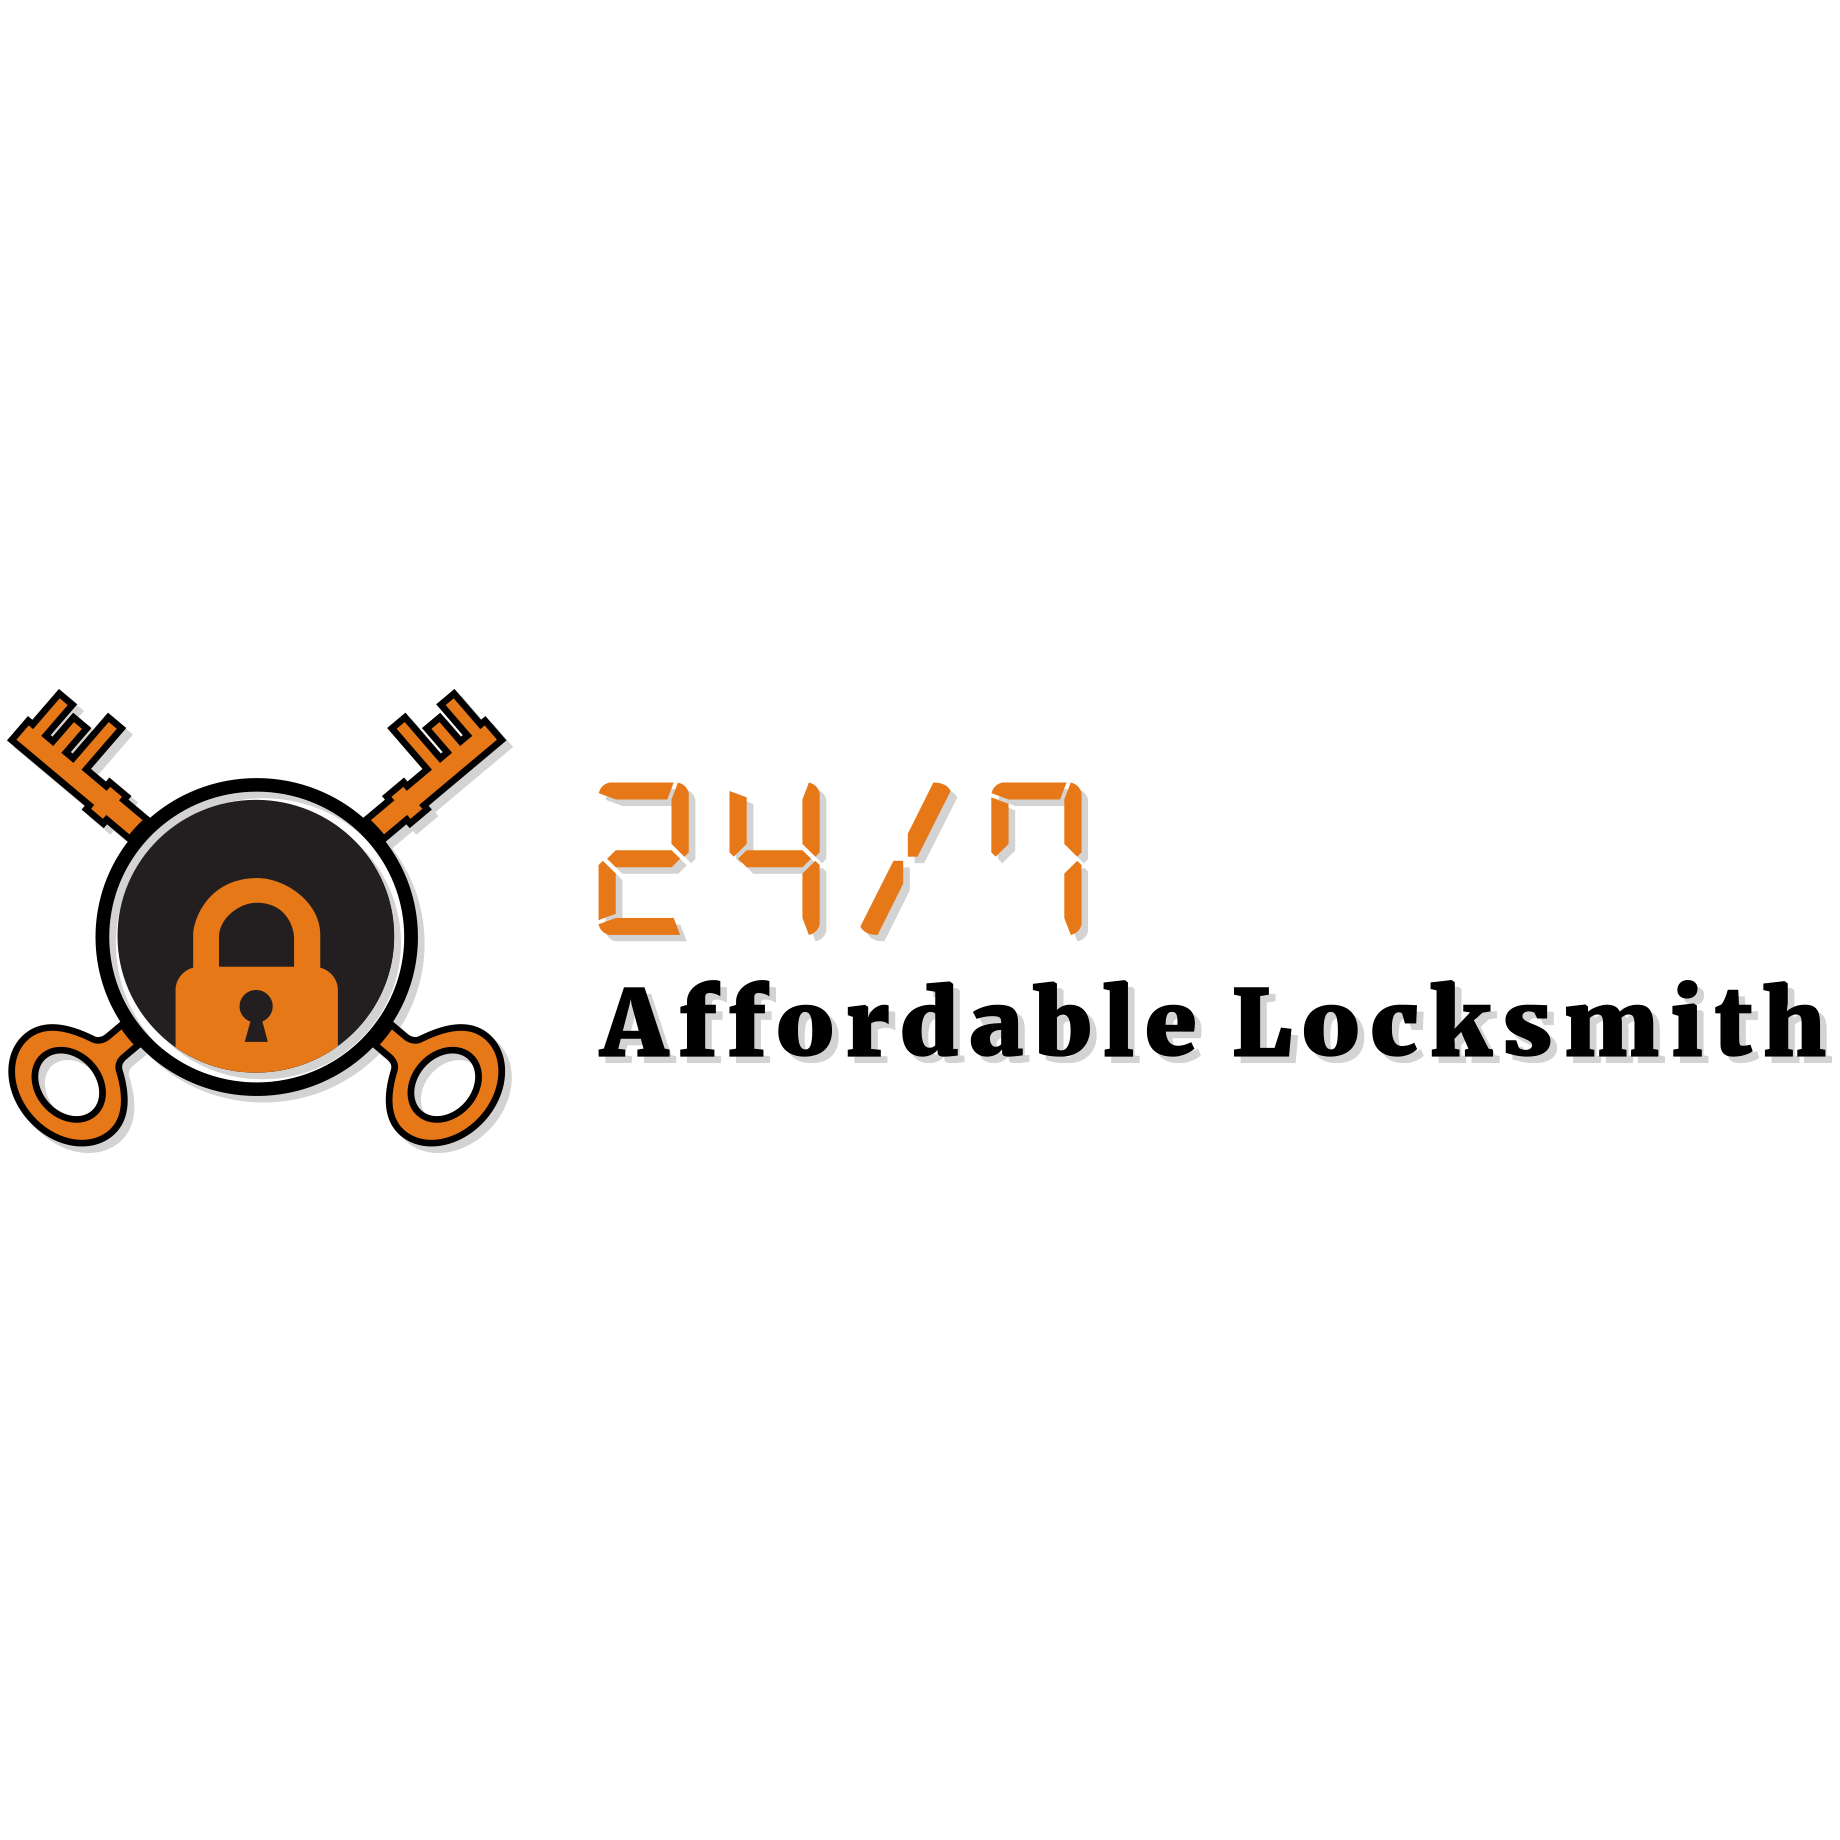 24/7 Affordable Locksmith